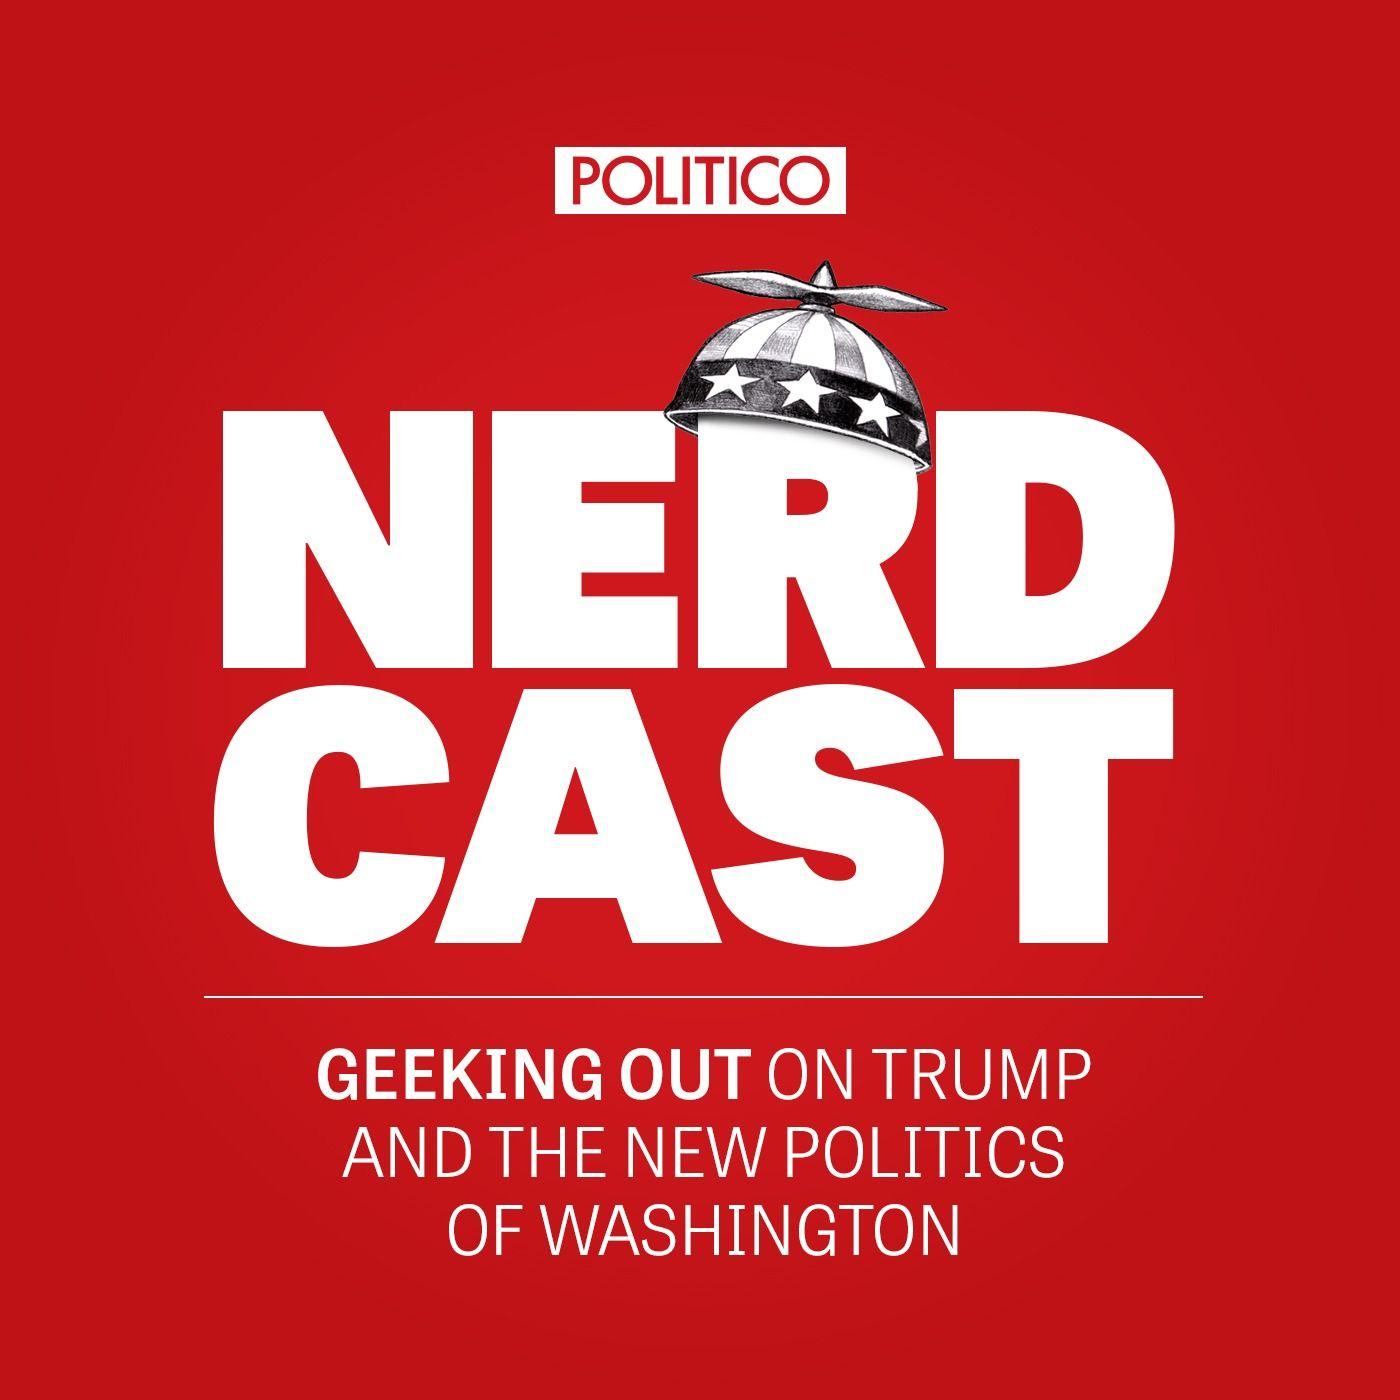 Nerdcast bonus: The presidential race enters a new phase